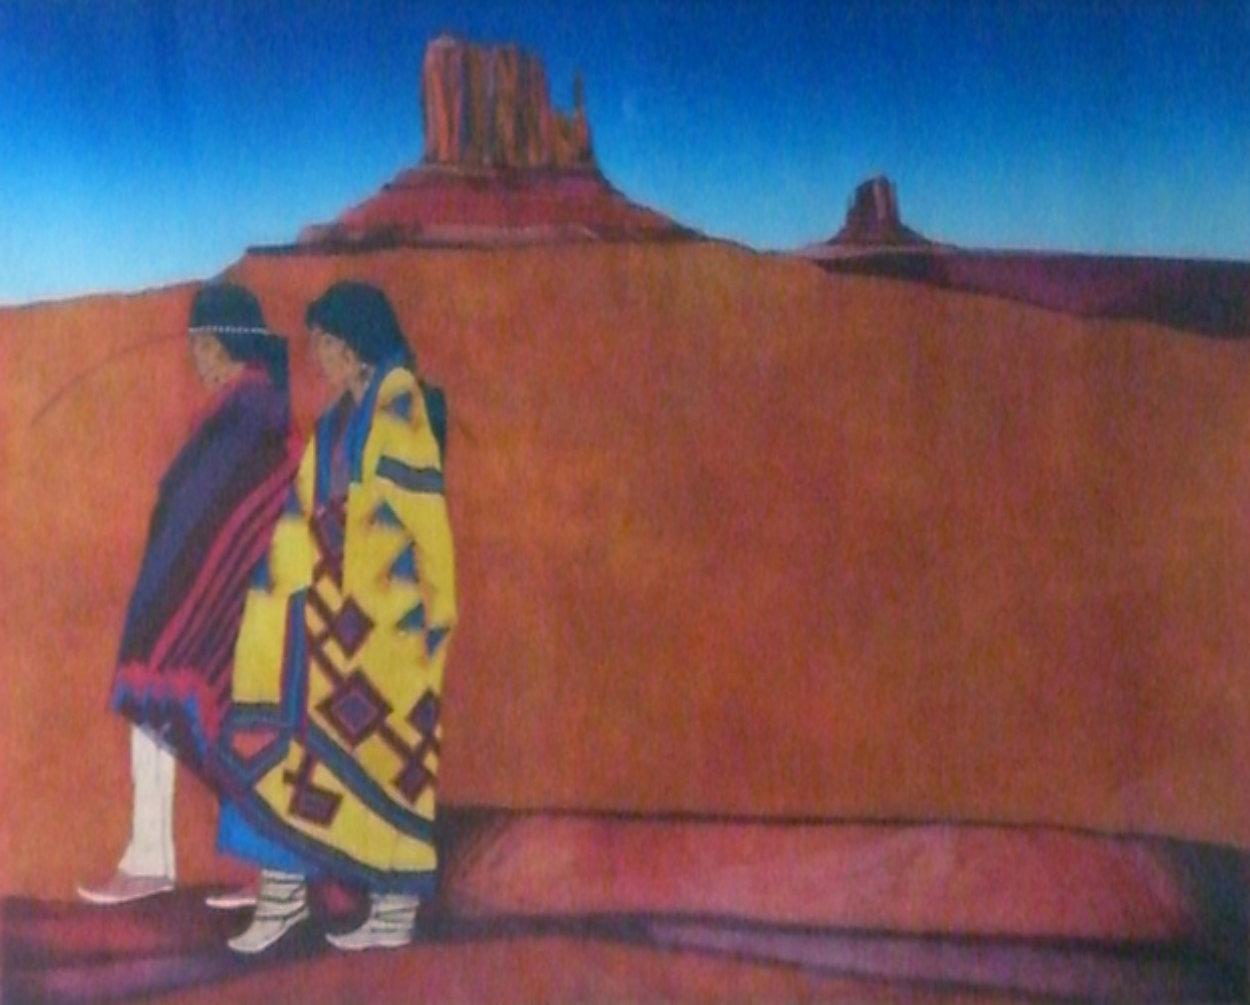 Colcha Series: Valle de Colores 1989 Limited Edition Print by Amado Pena